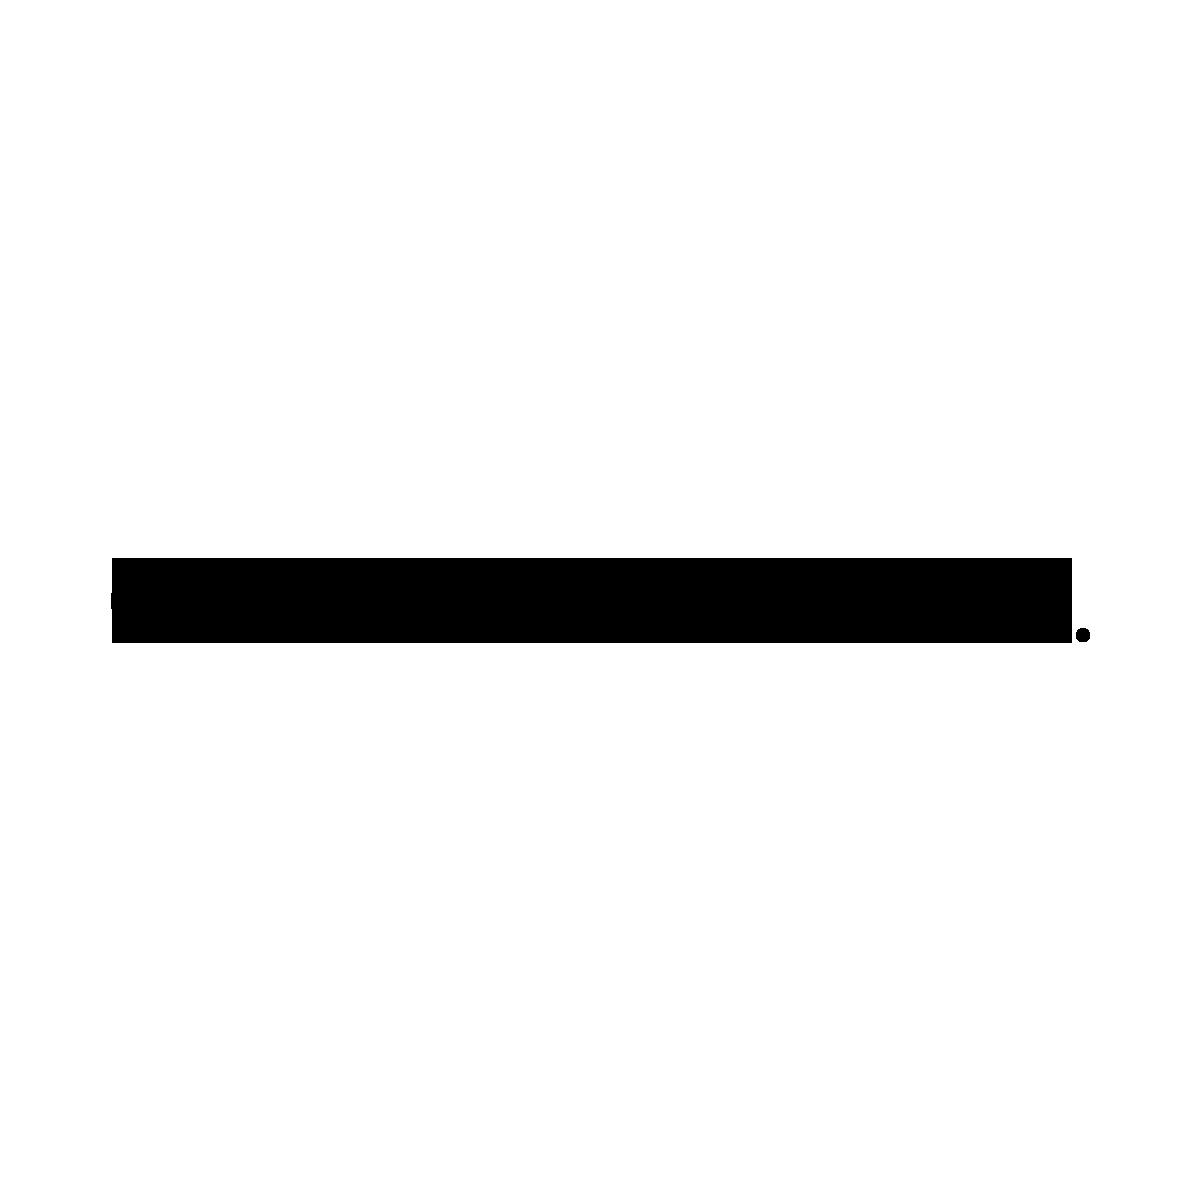 Sneaker-Dip-Wit/Blauw